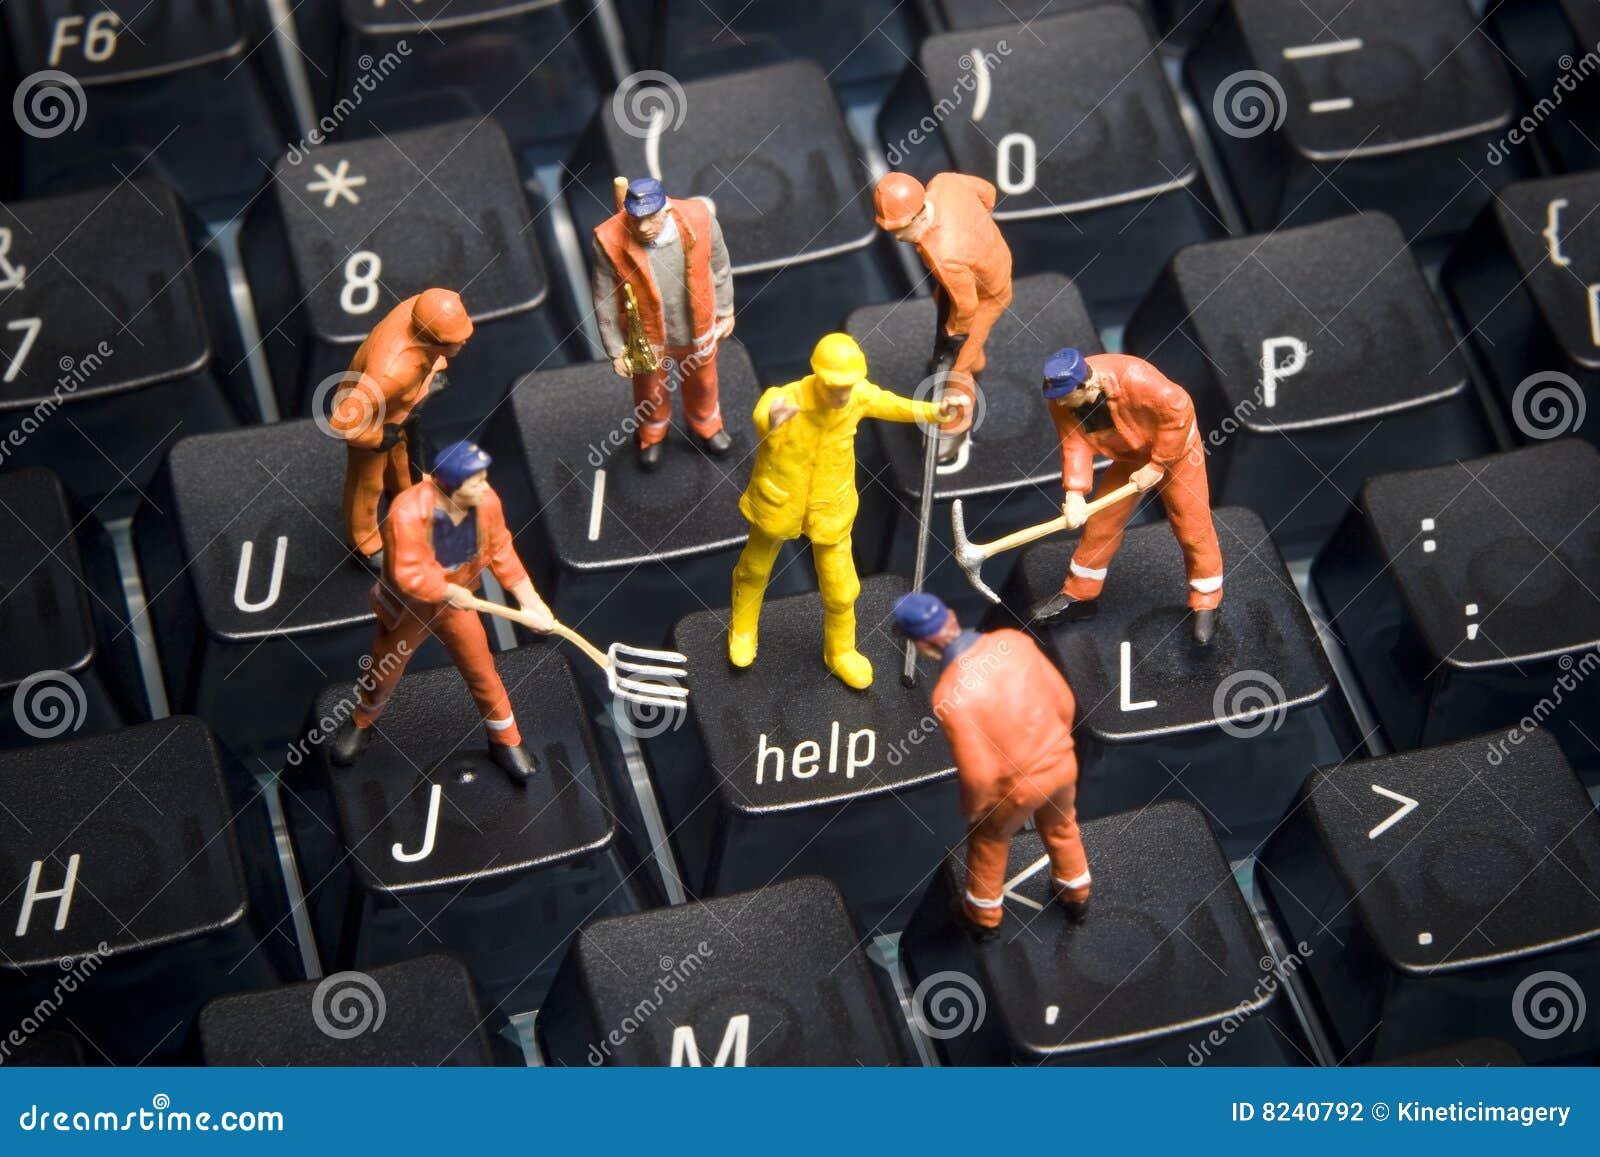 техник поддержки помощи